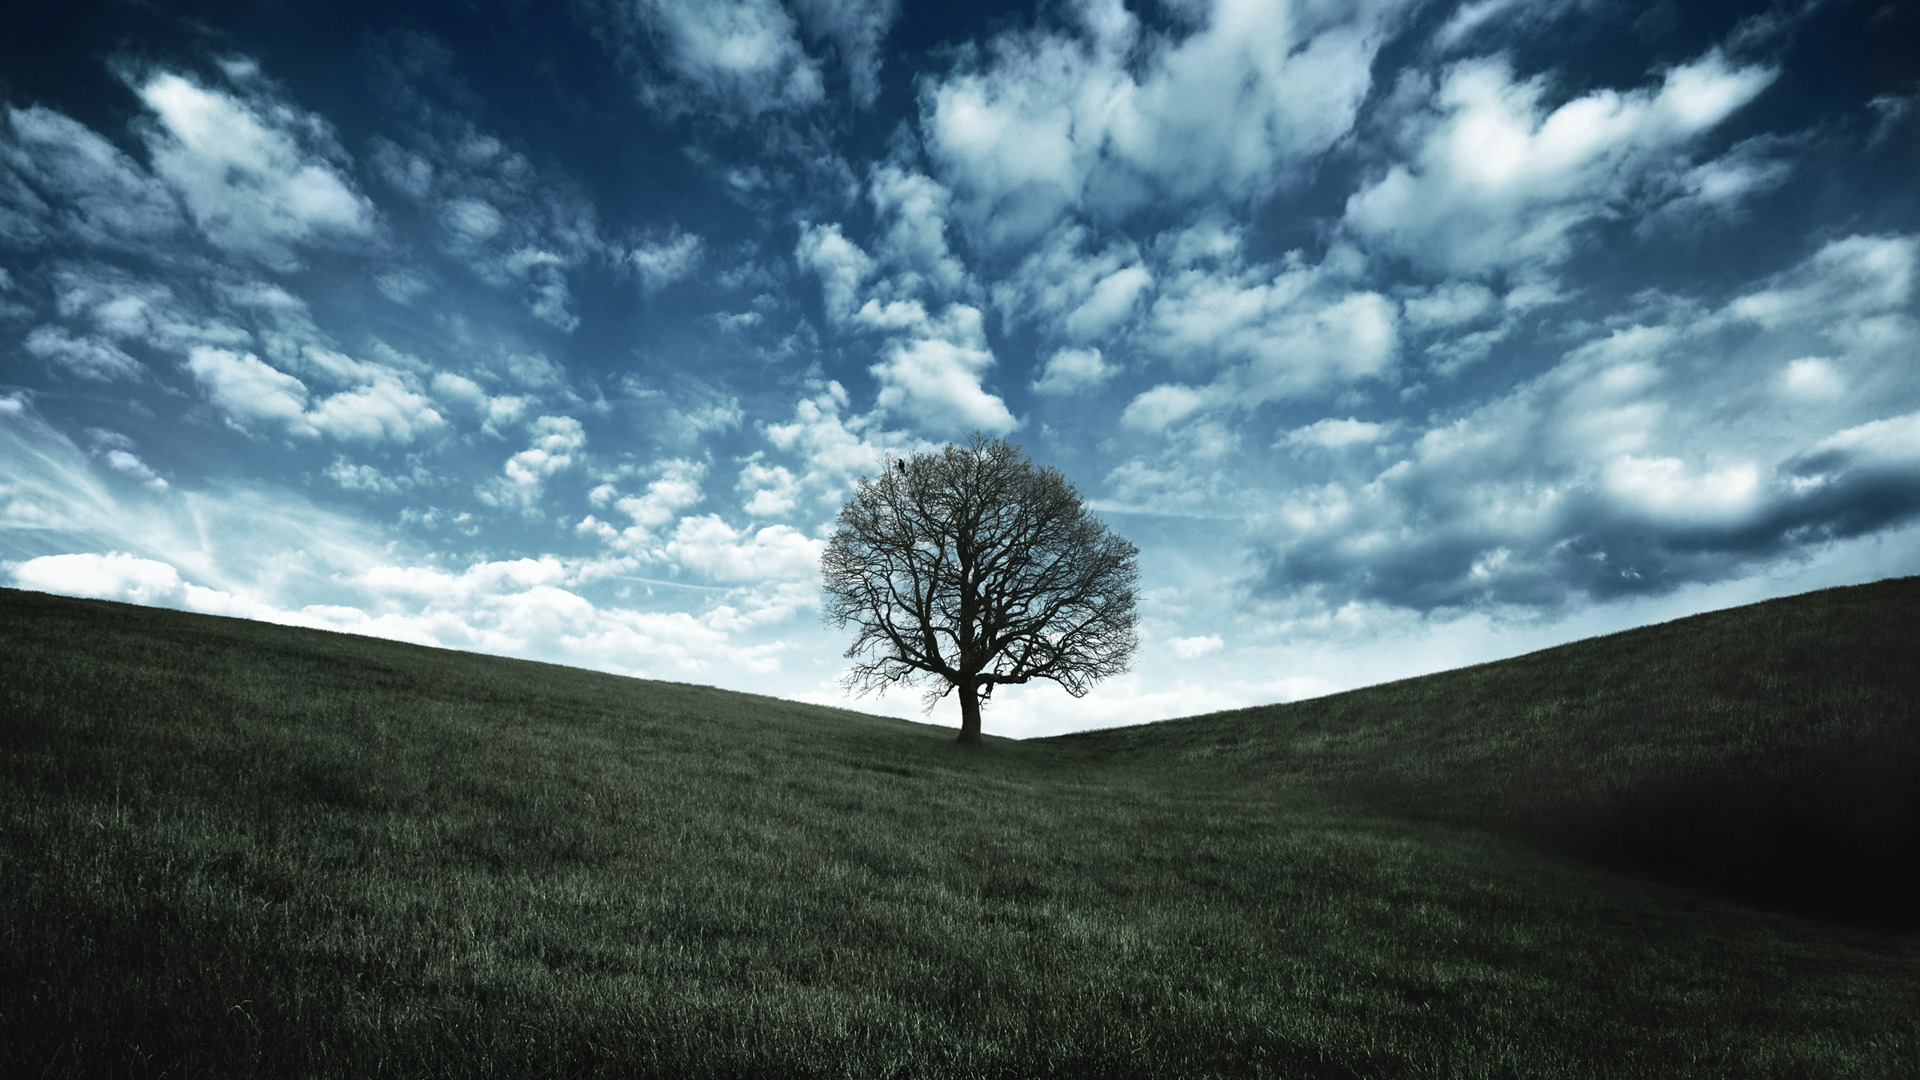 Oak Tree Crow Landscape Wallpaper High Quality 1920x1080